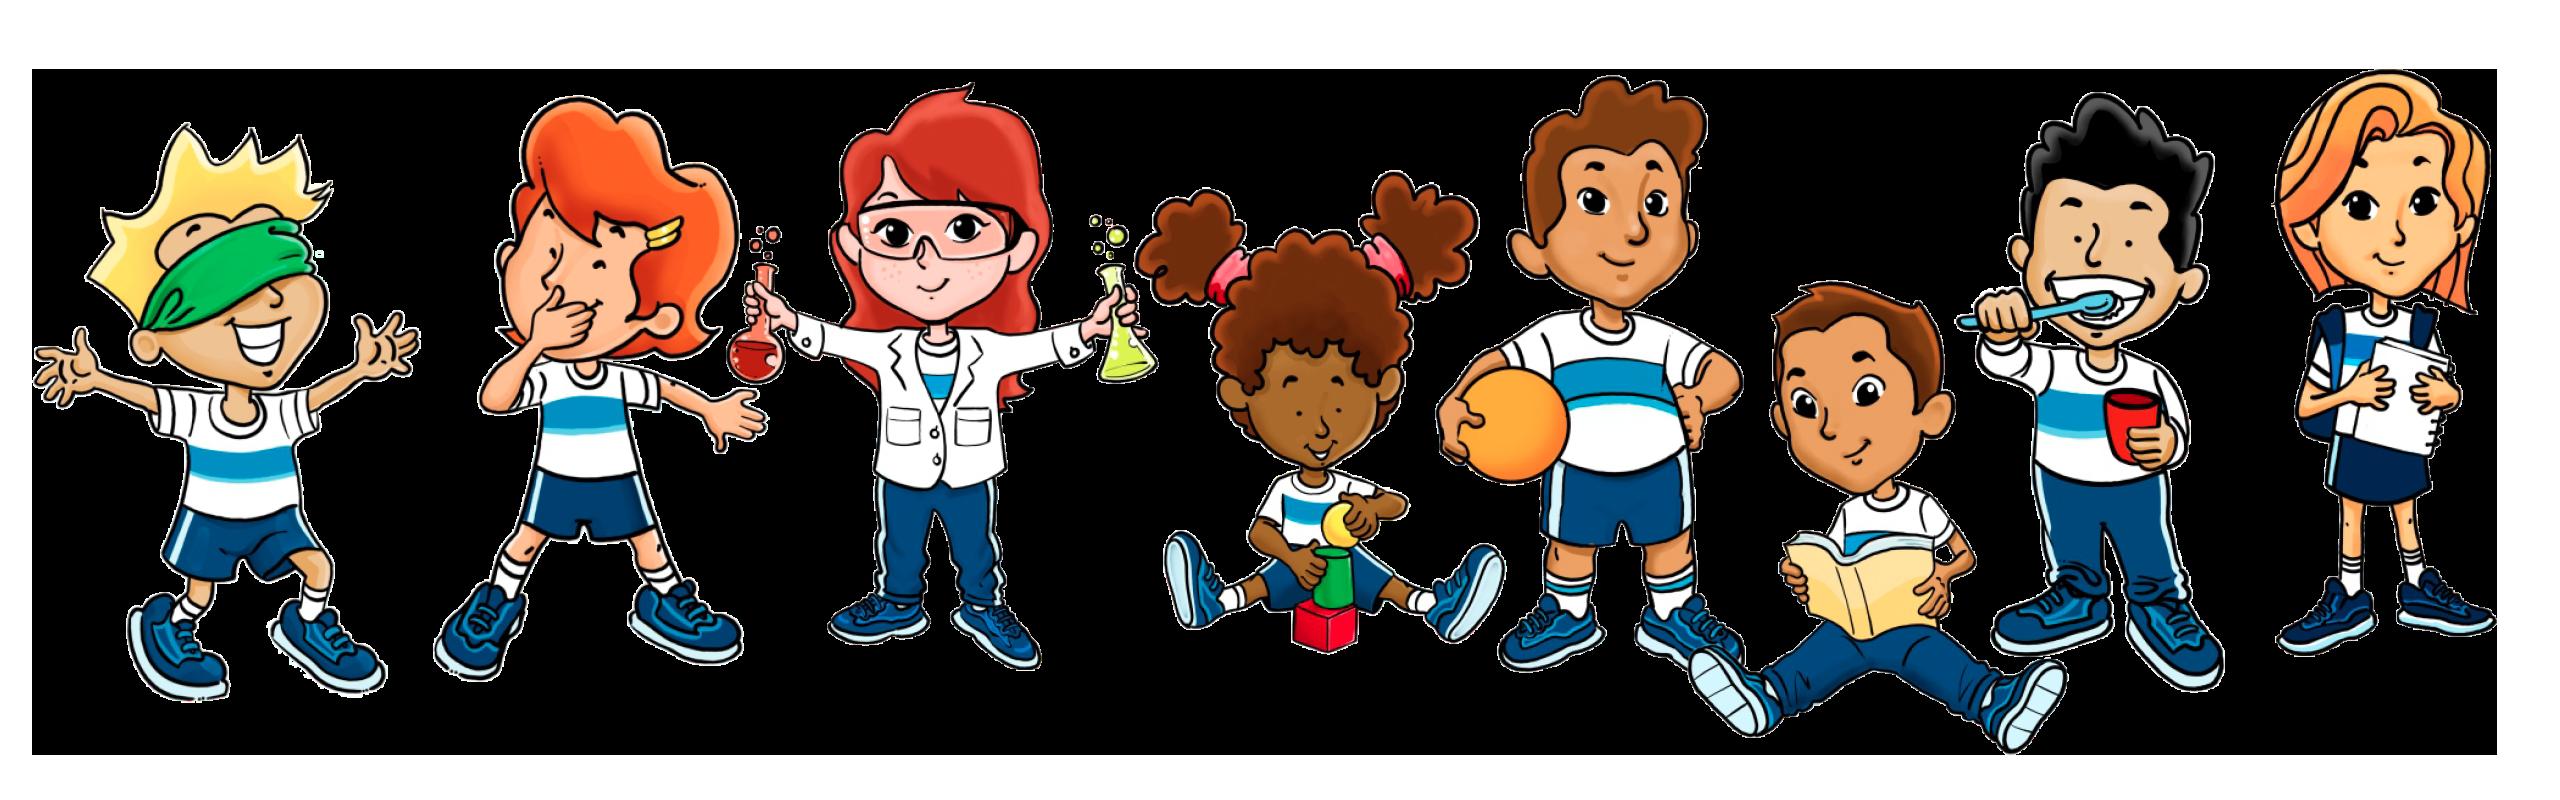 prefeitura-itapevi-criancas